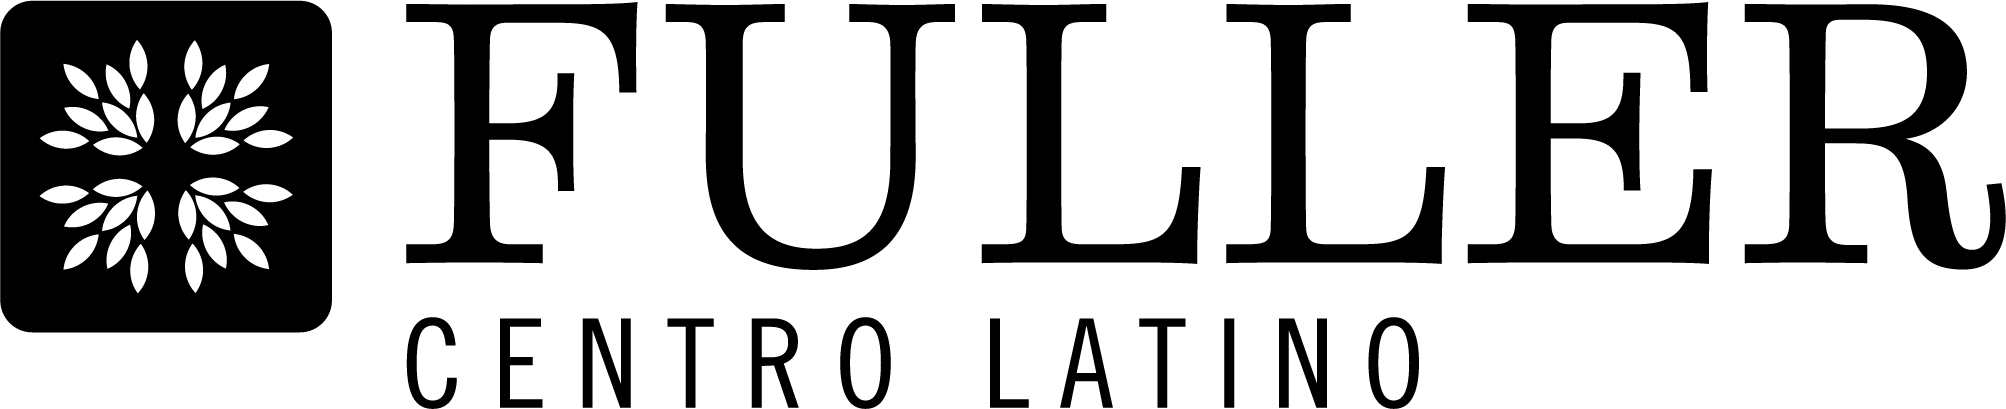 AETH Ally | Fuller Theological Seminary